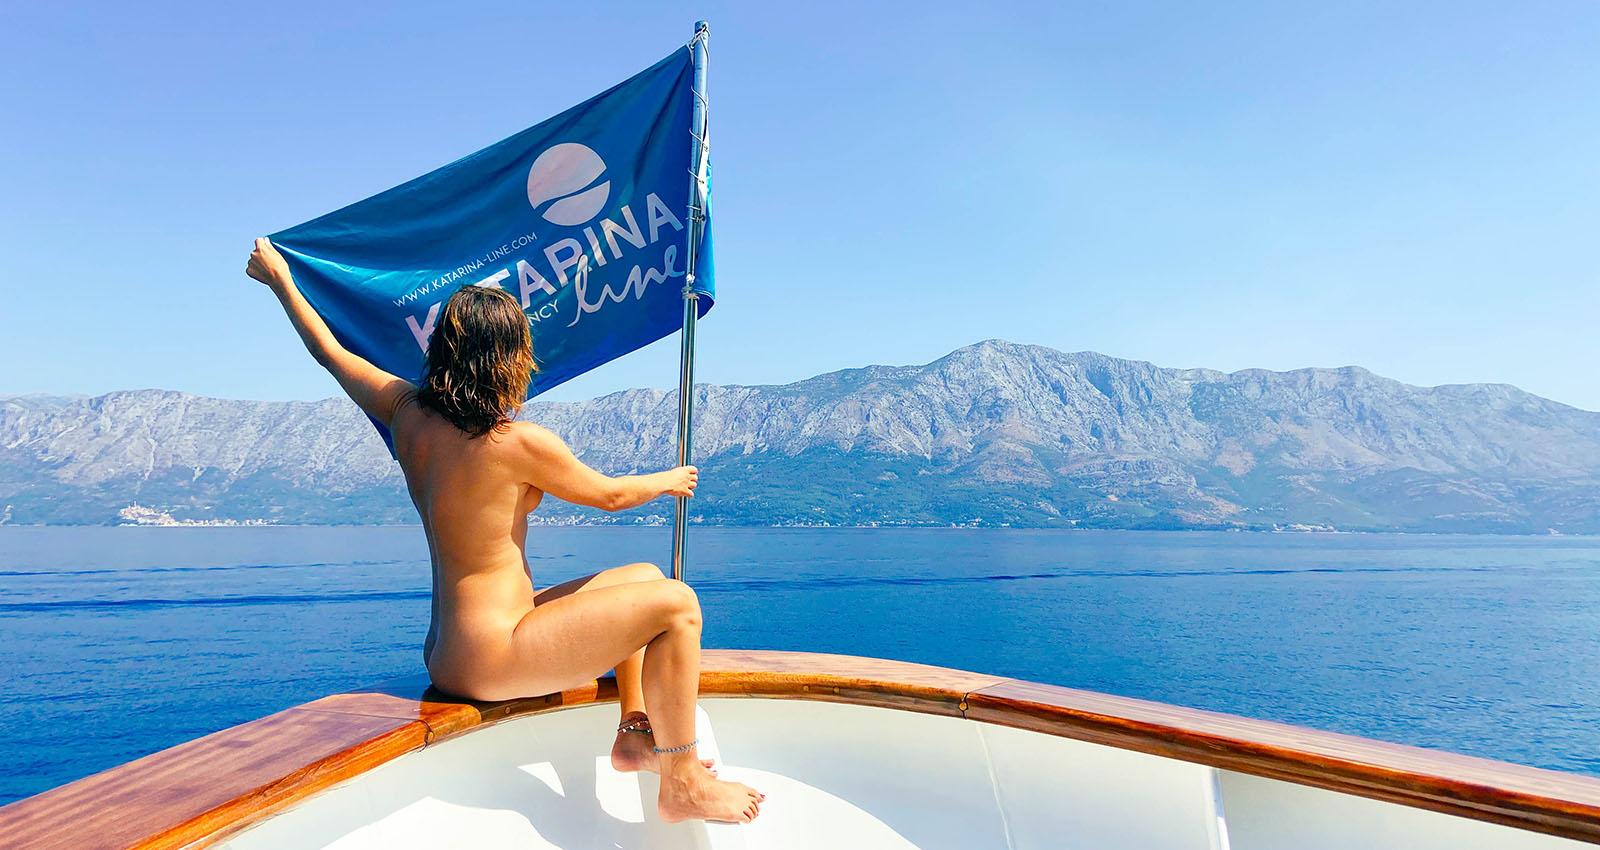 The Katarina Lines Naturist Cruise in Croatia